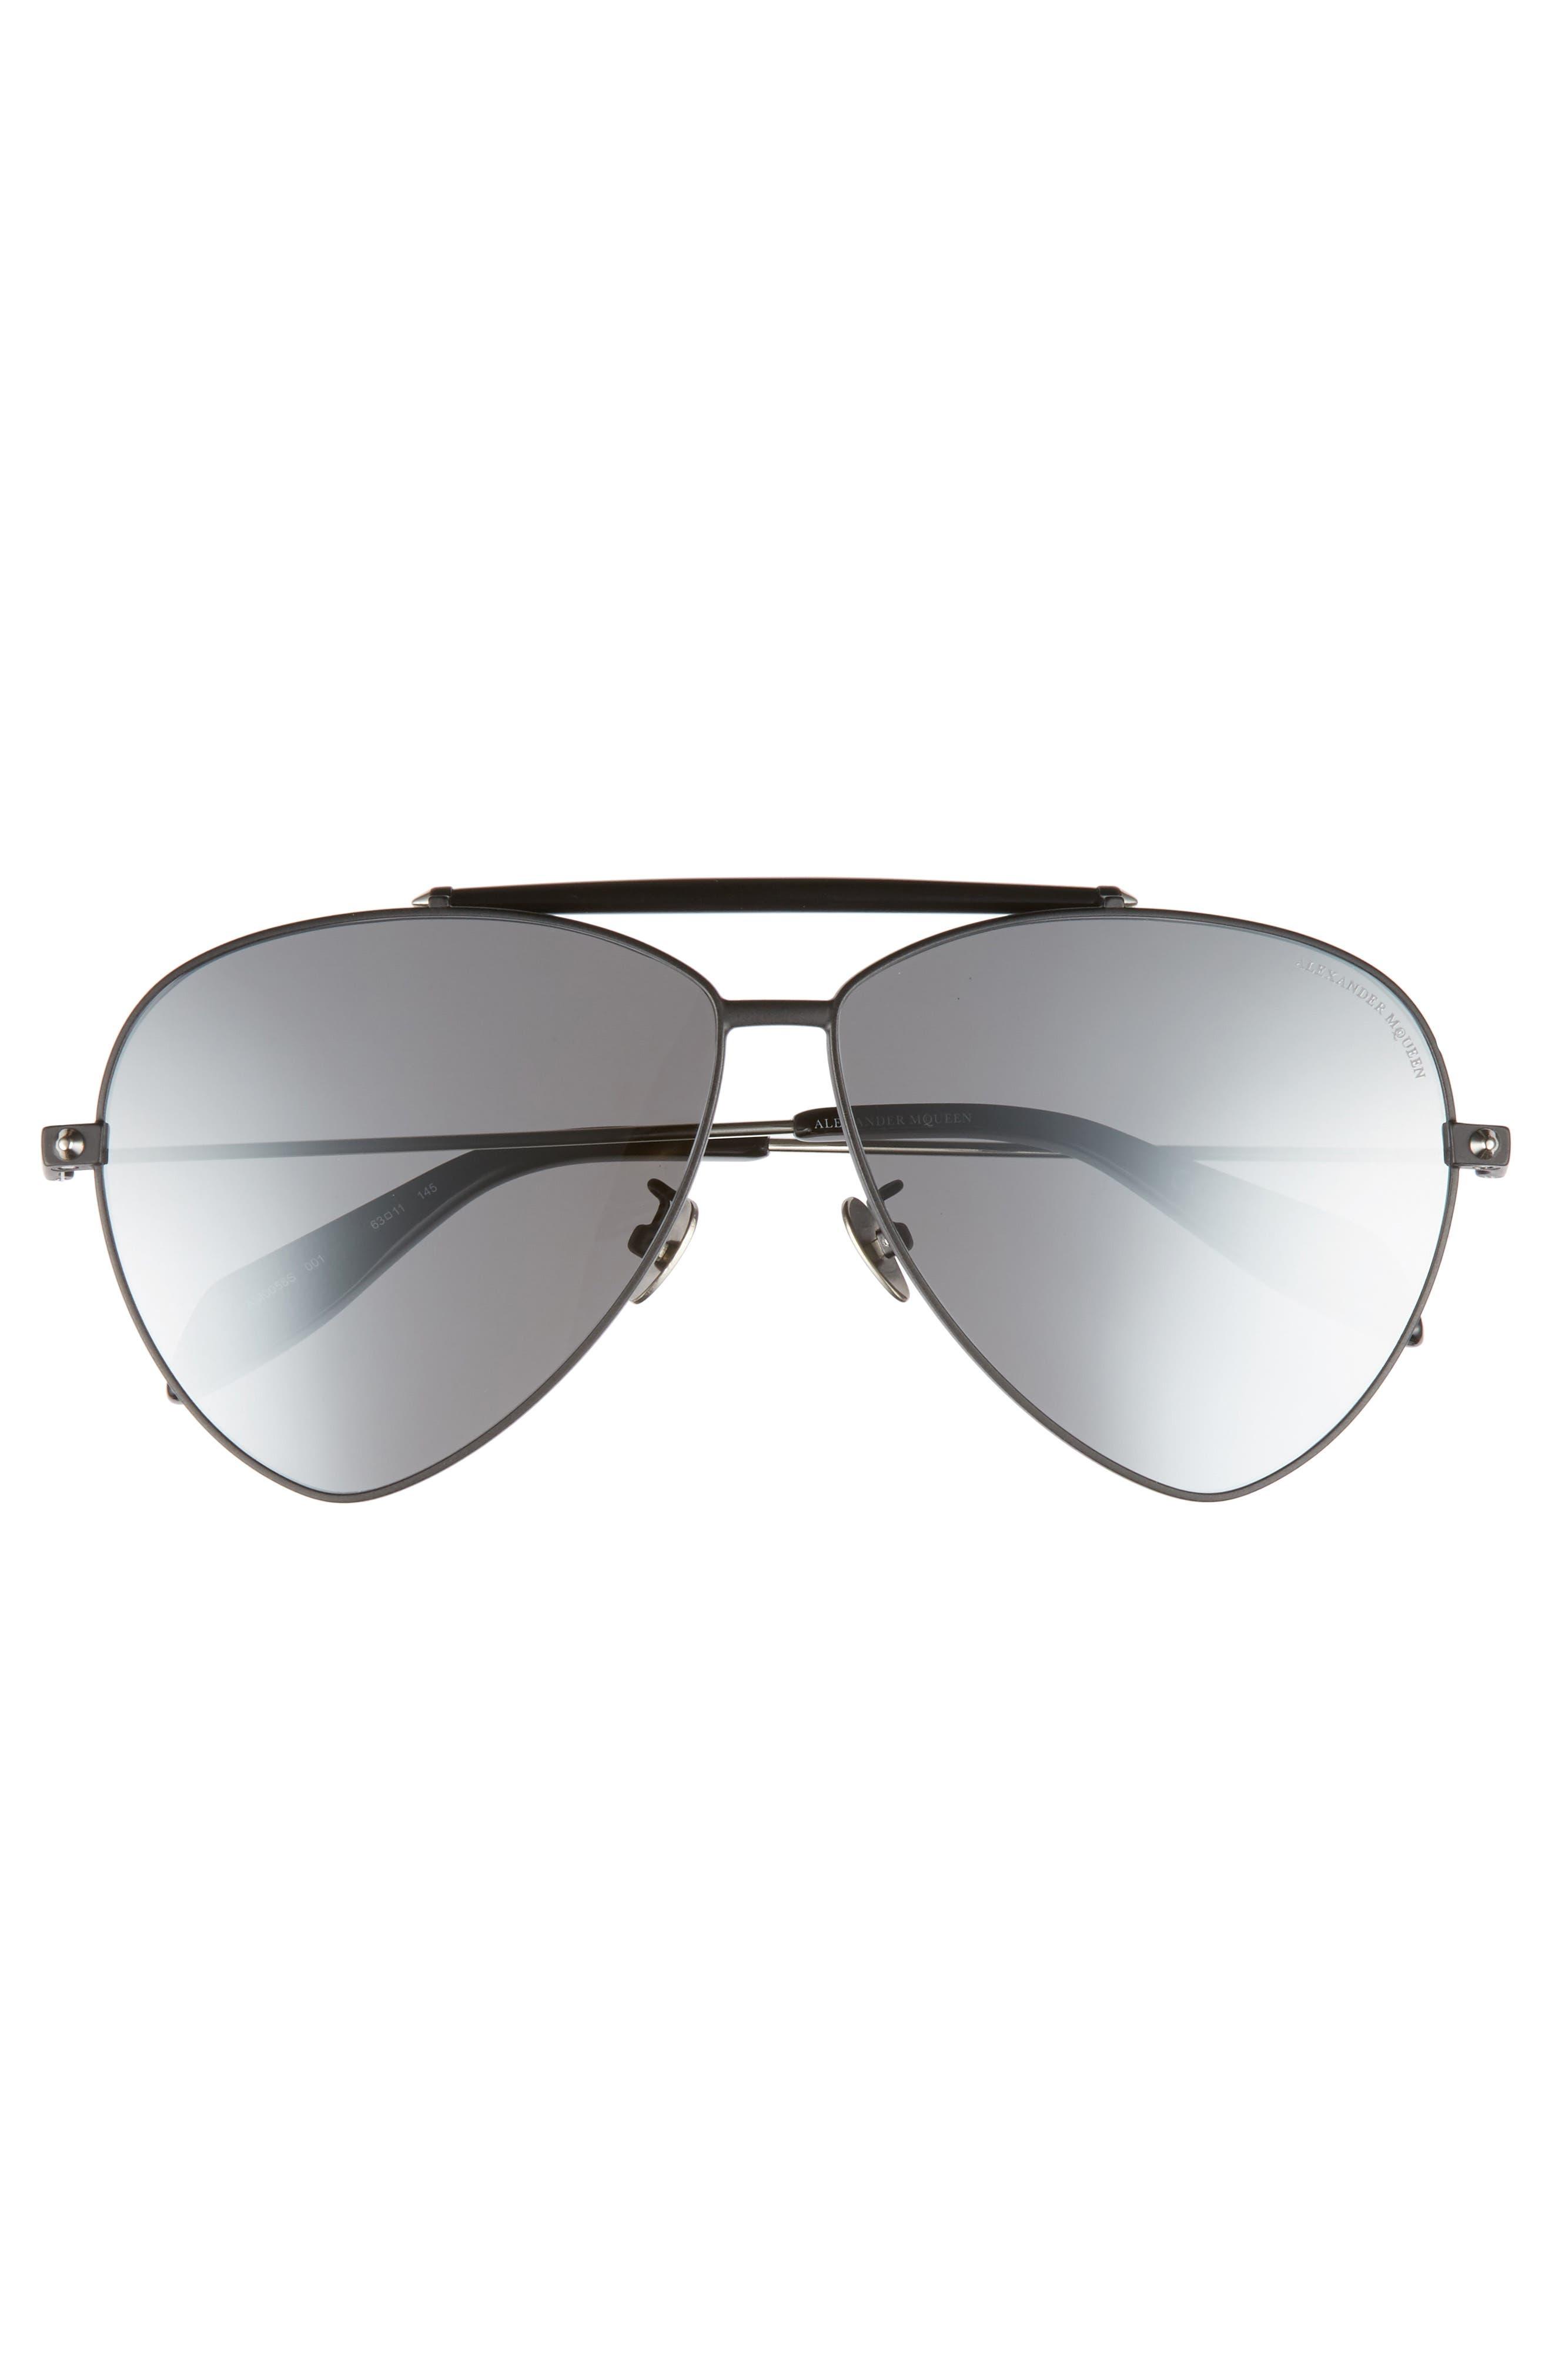 63mm Oversize Aviator Sunglasses,                             Alternate thumbnail 3, color,                             Black